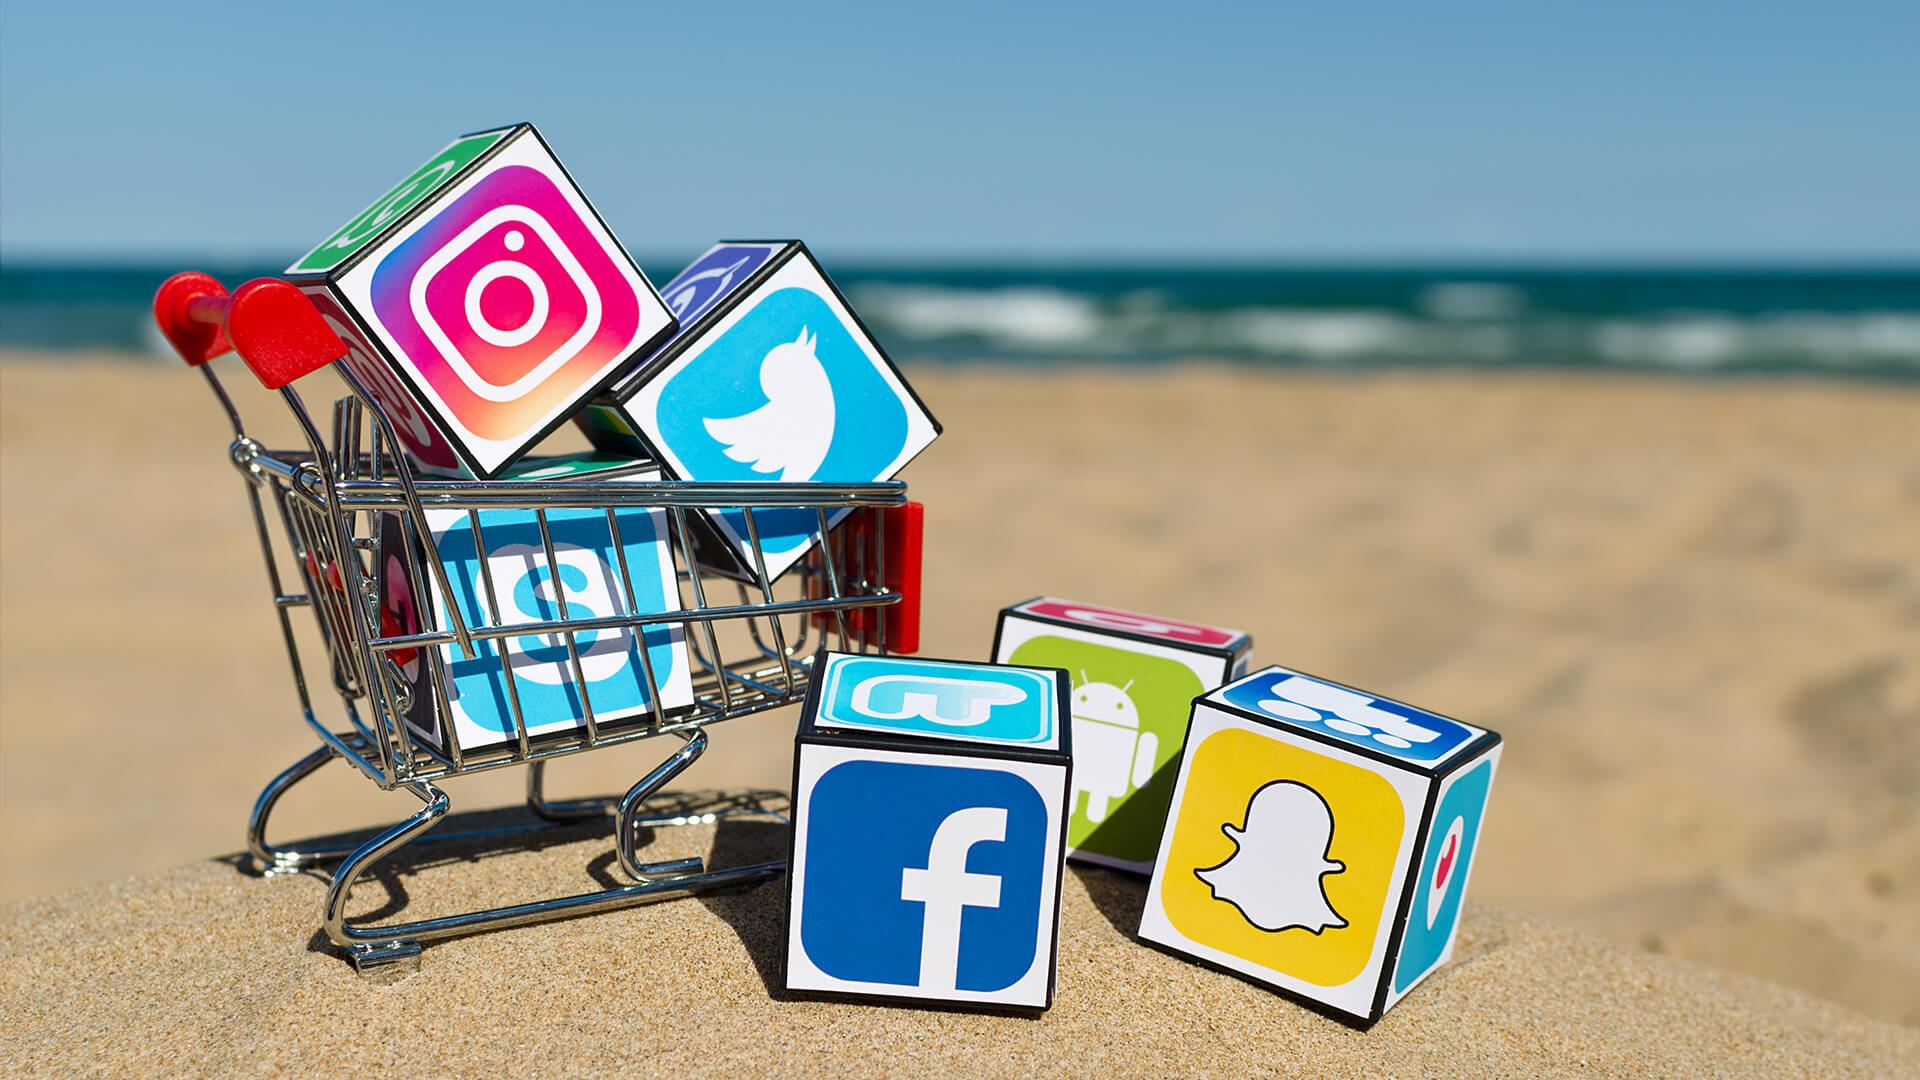 social-media-icons-shopping-cart-ss-1920.jpg